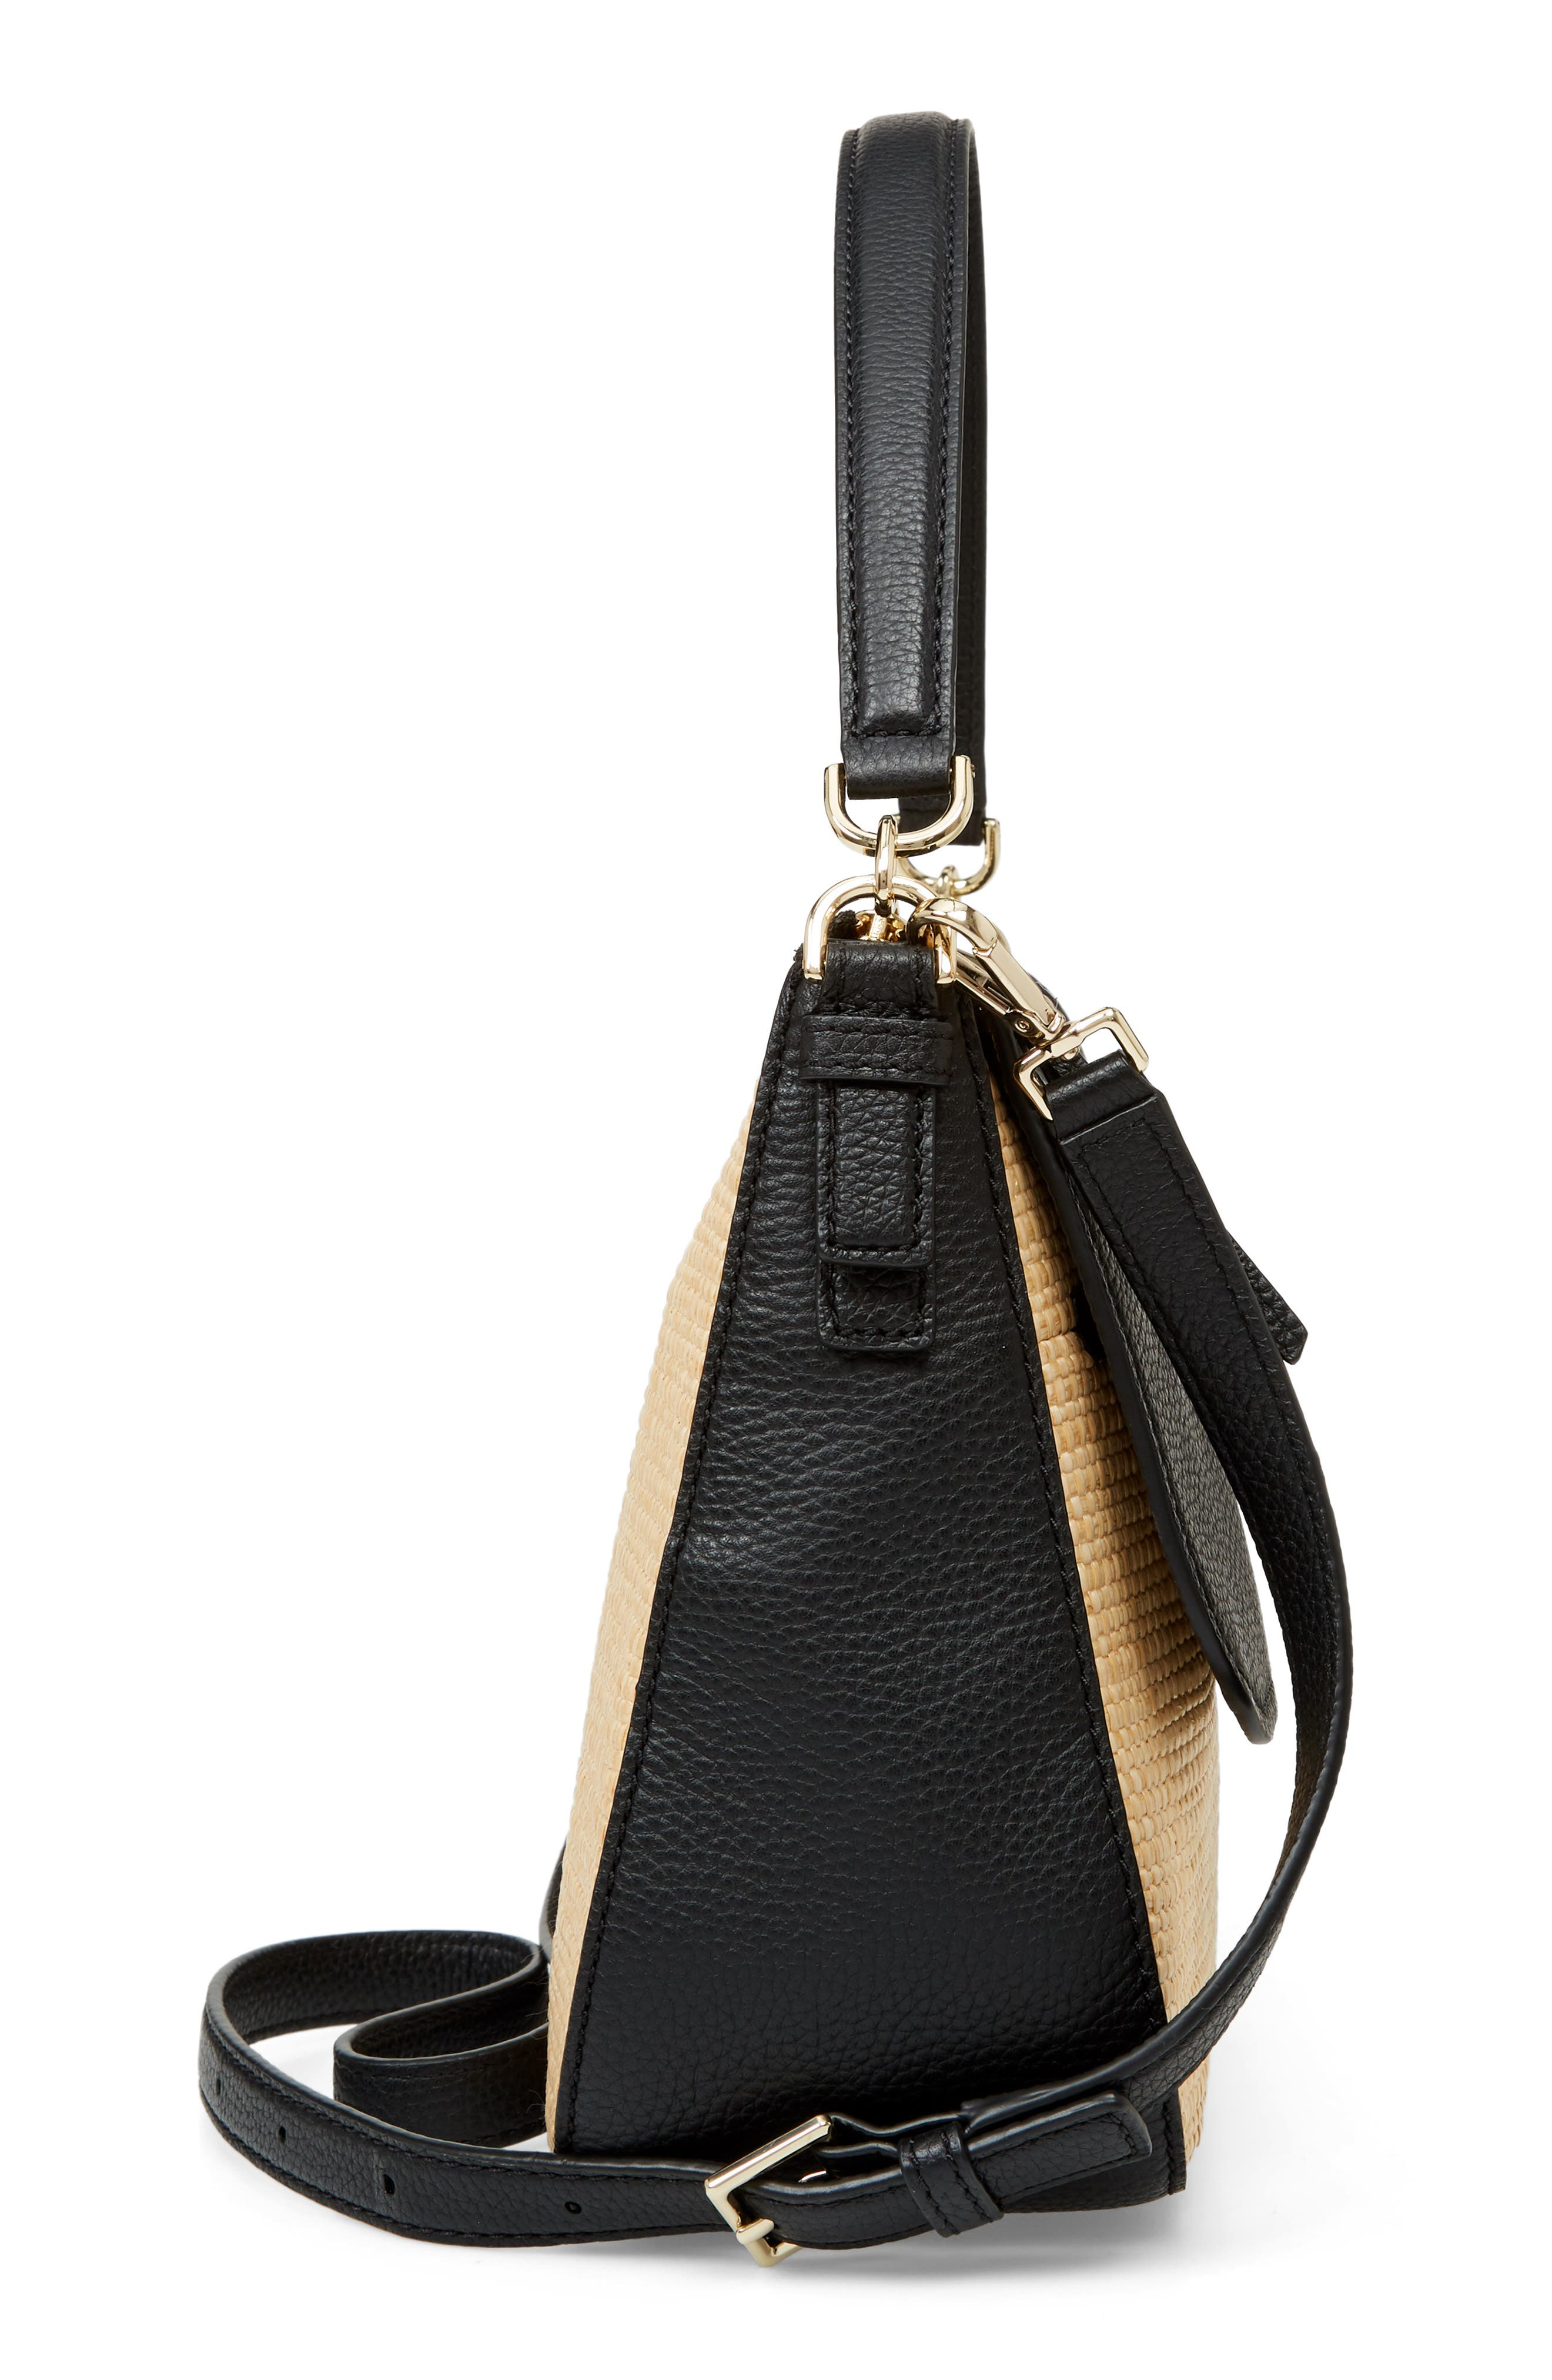 KATE SPADE NEW YORK,                             jackson street - colette straw & leather satchel,                             Alternate thumbnail 5, color,                             257